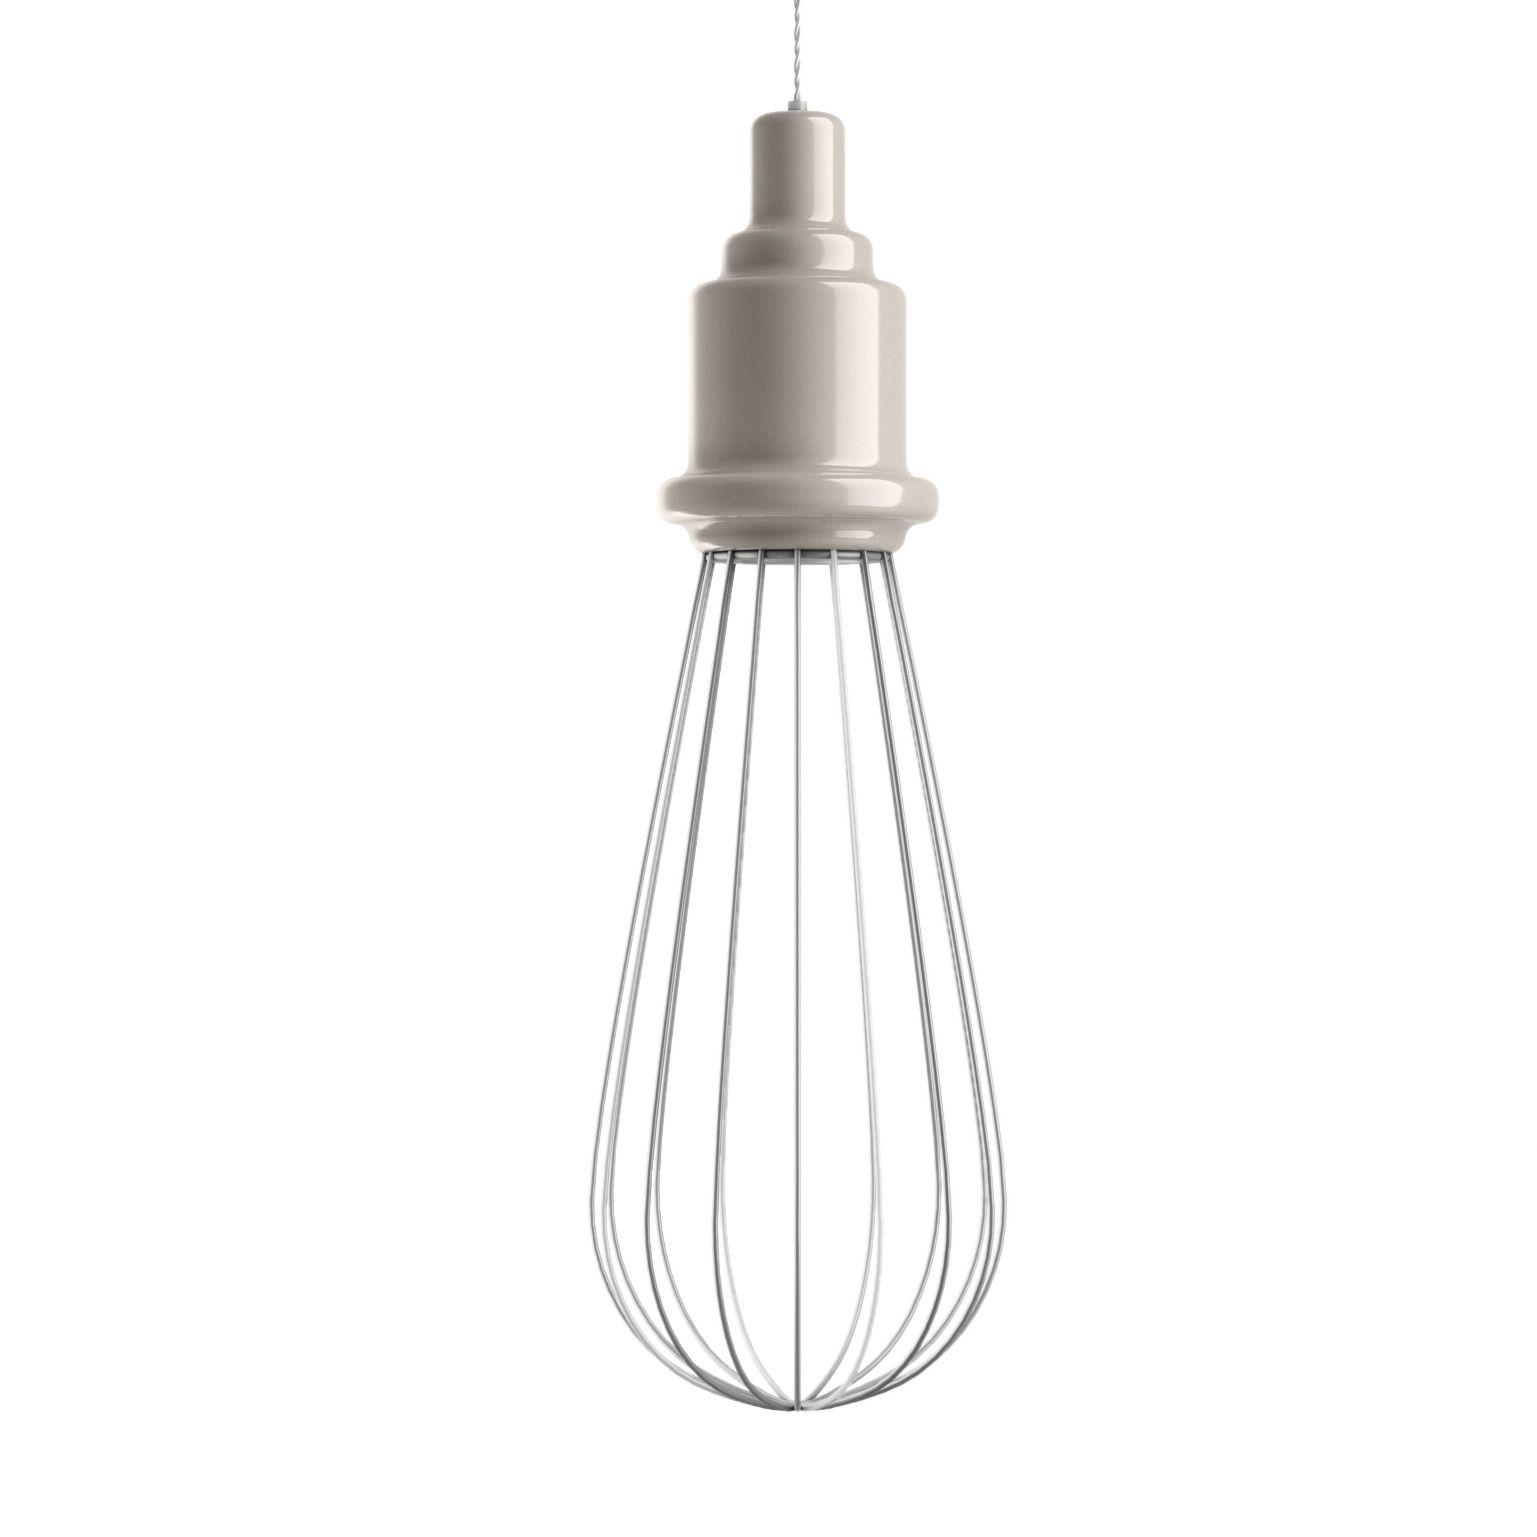 02190gd pendant lamp by marioni design pokedesignstudio